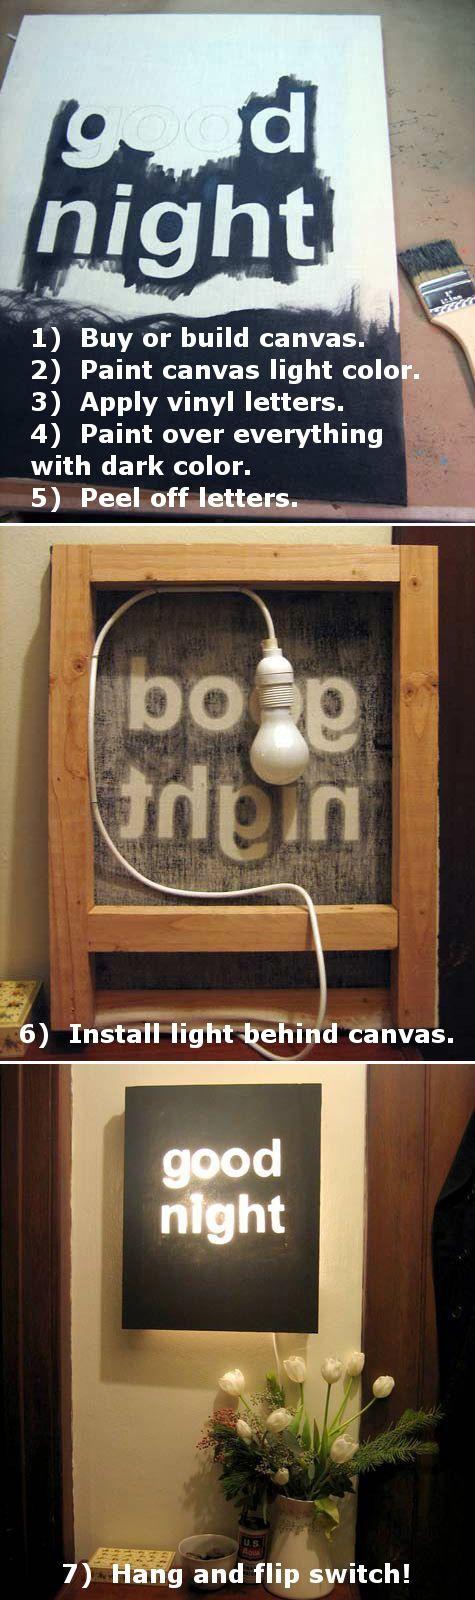 #DIY #nightlight #craft http://wallsthatspeak.uppercaseliving.net/Home.m